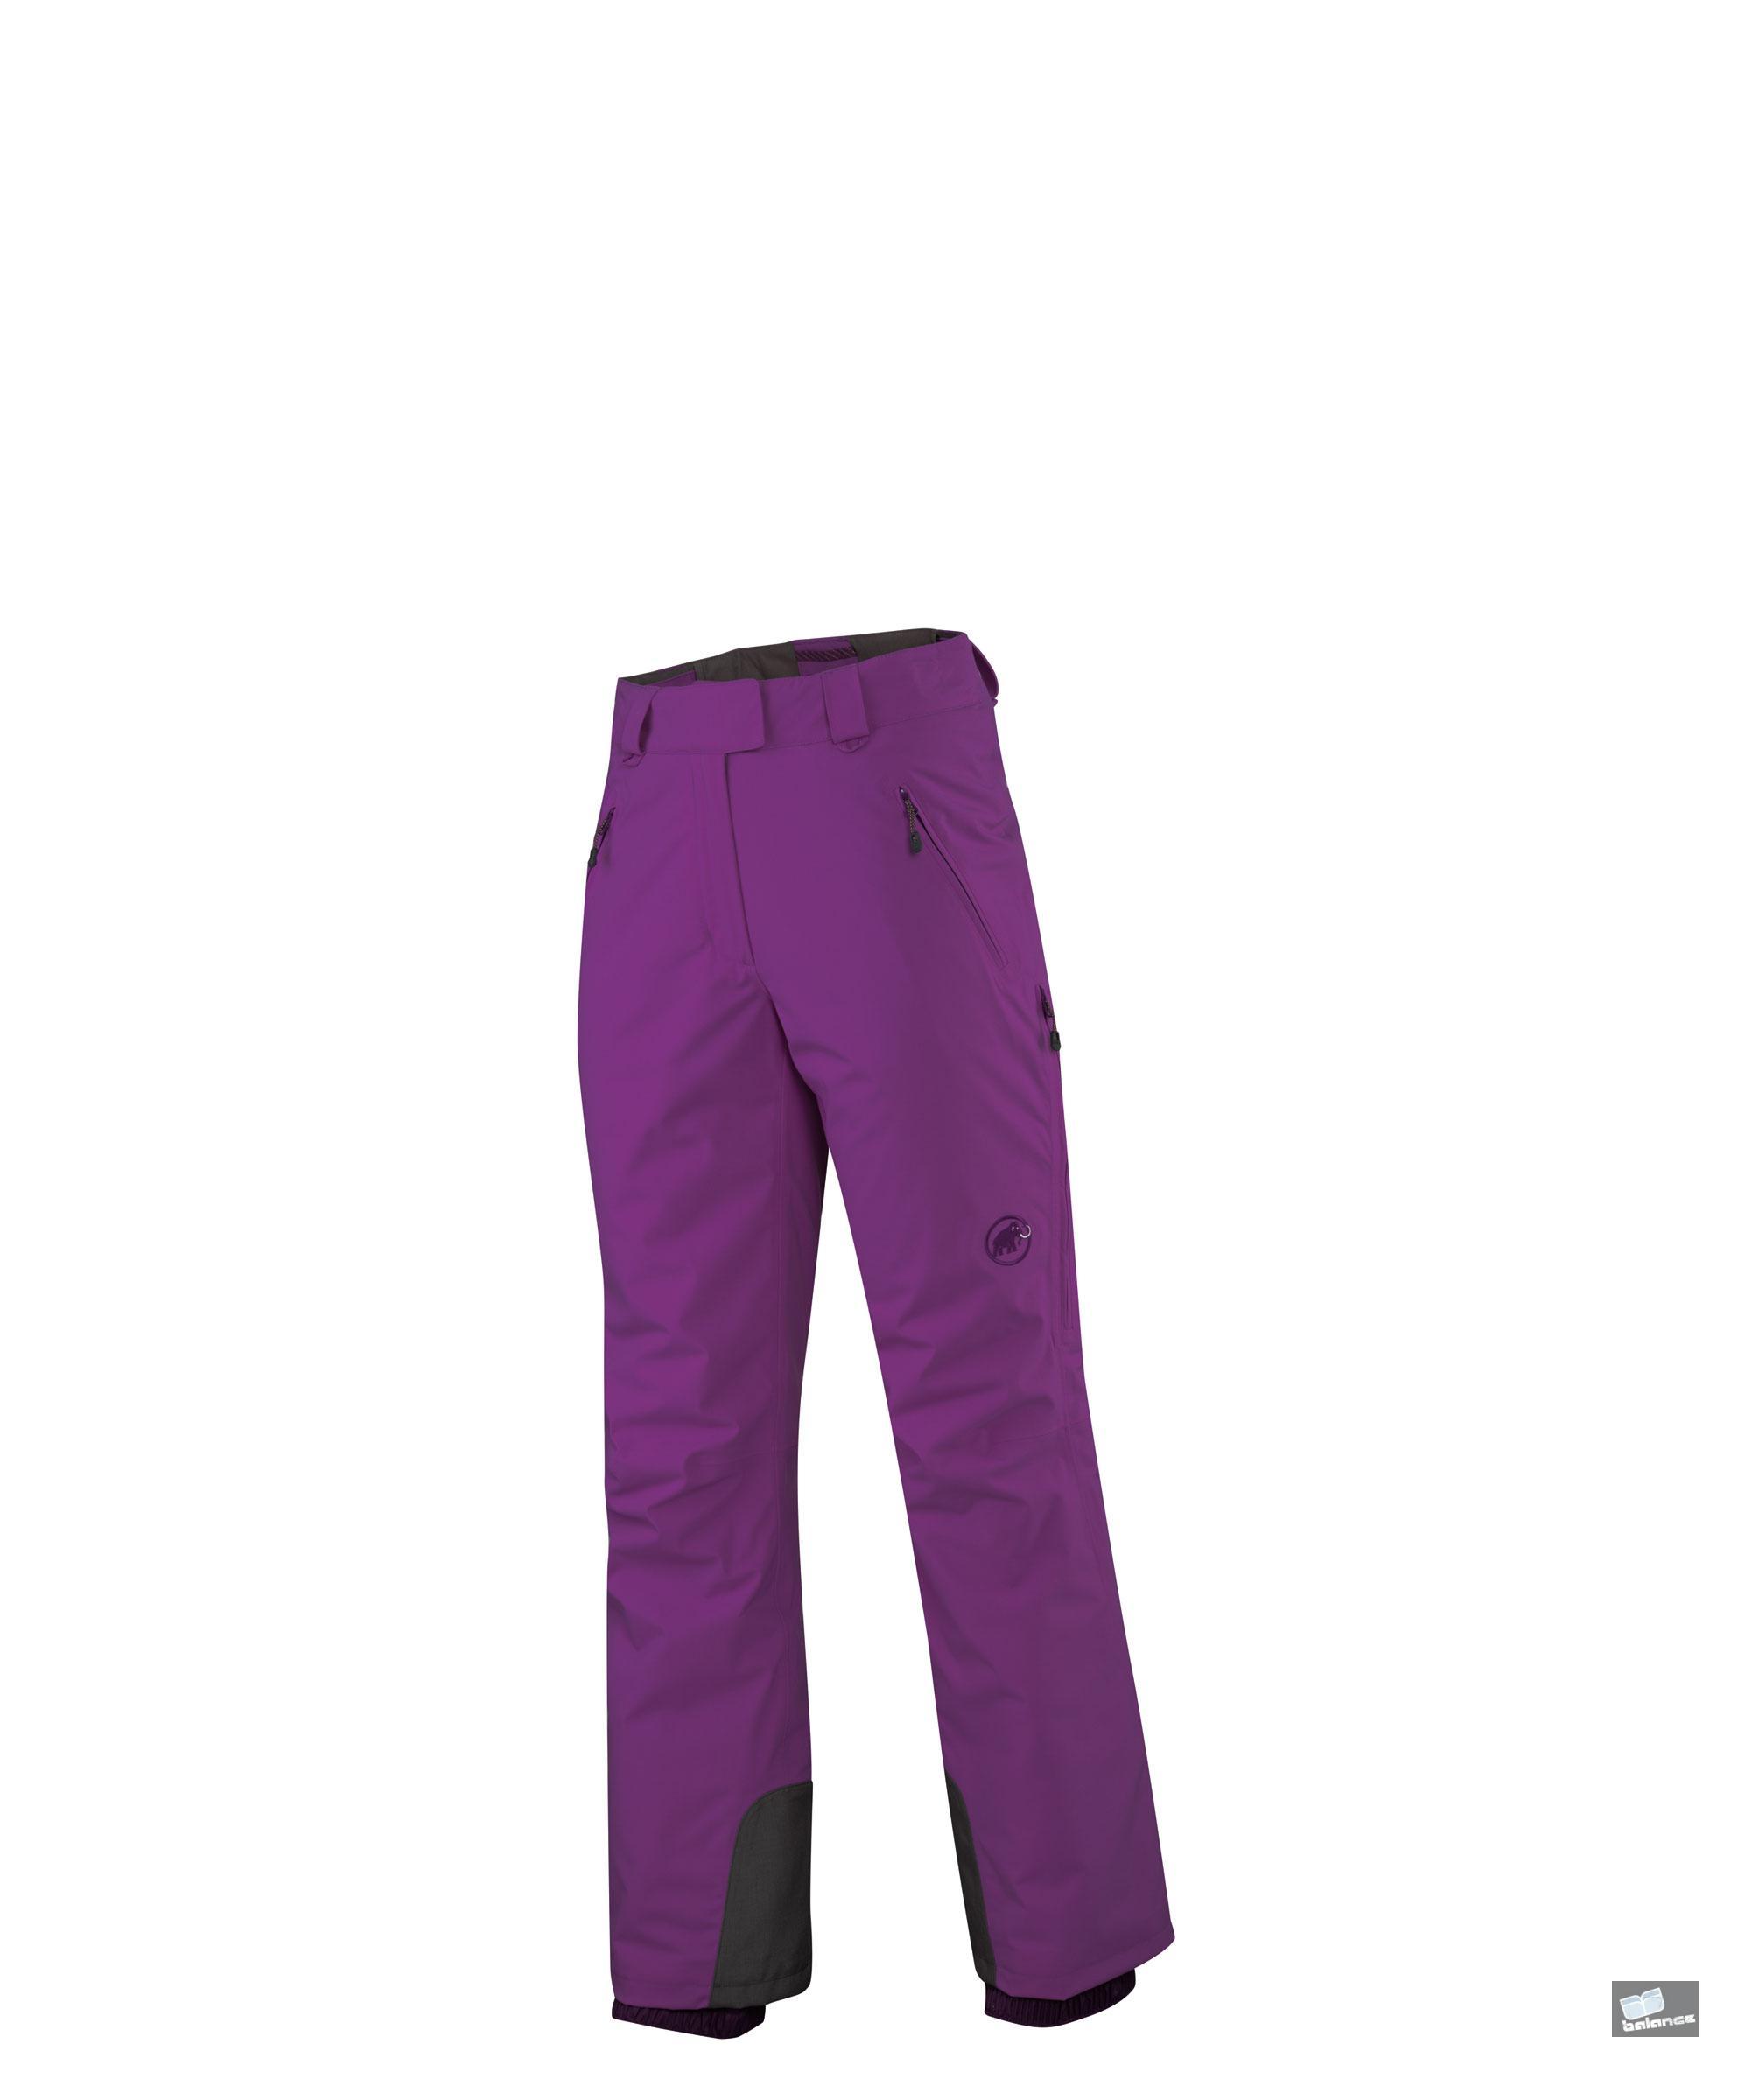 mammut nara pants women damen skihose bloom ebay. Black Bedroom Furniture Sets. Home Design Ideas